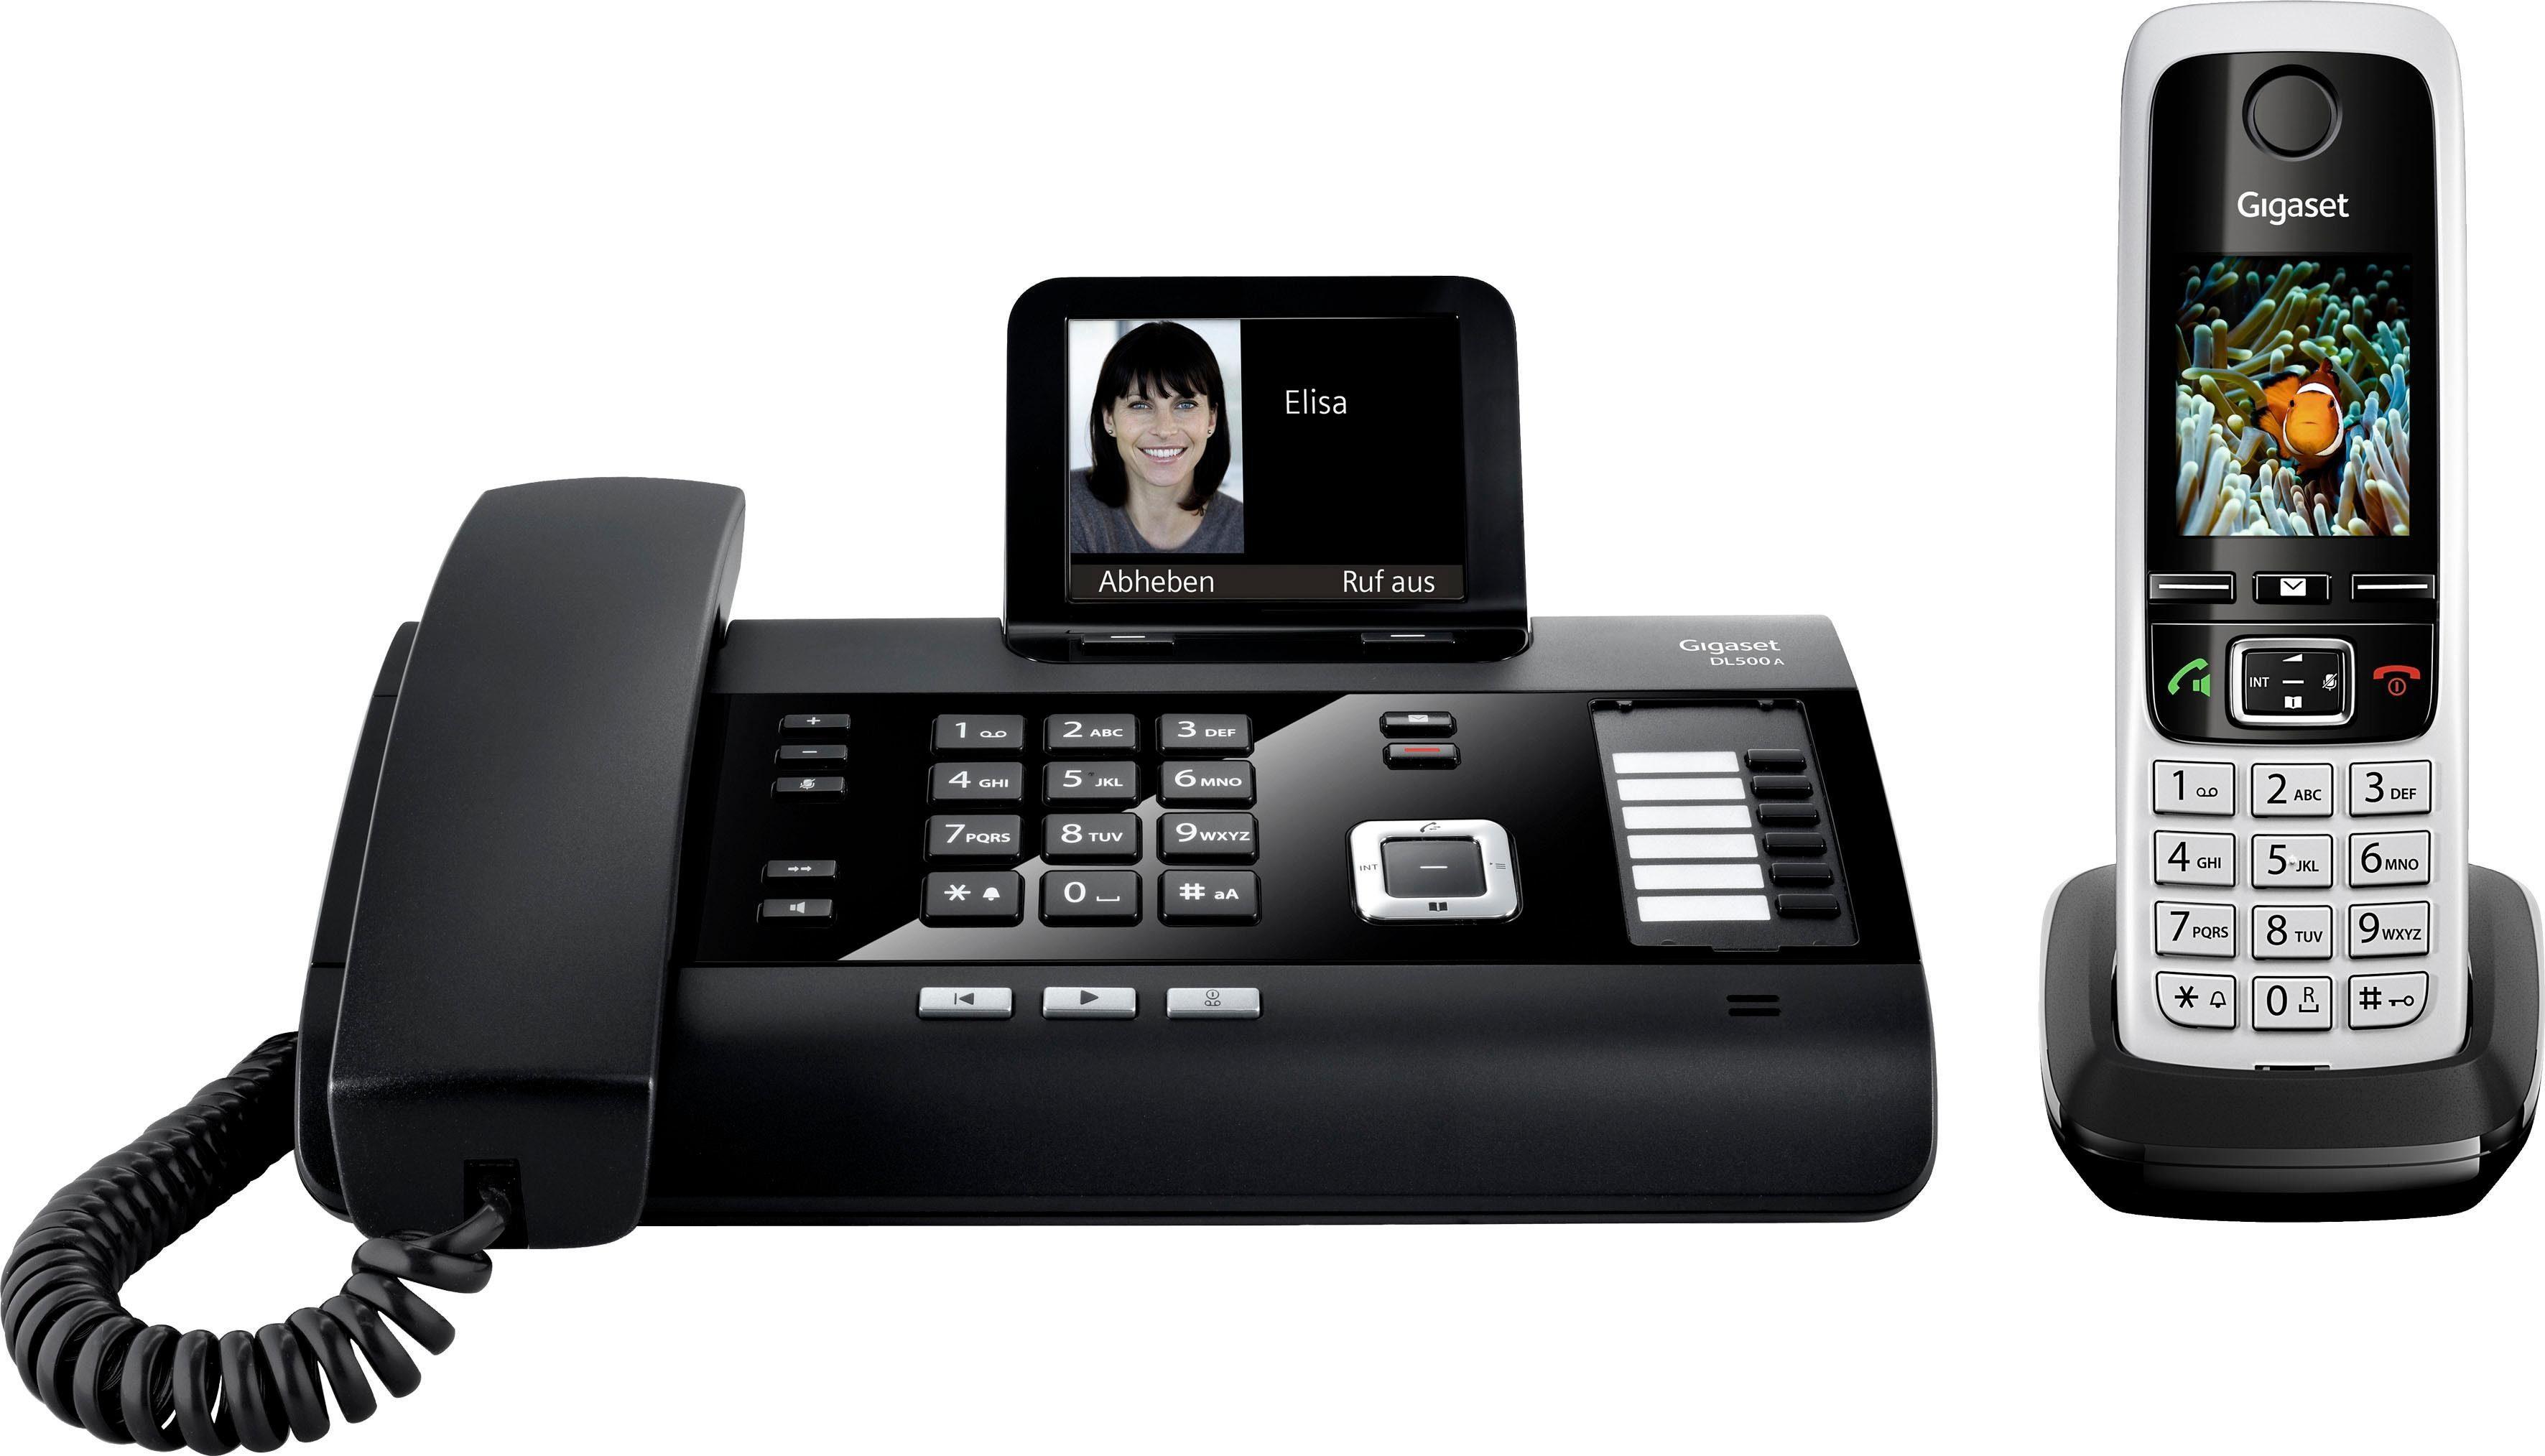 Gigaset DL500A + C430HX Telefon-Set mit AB